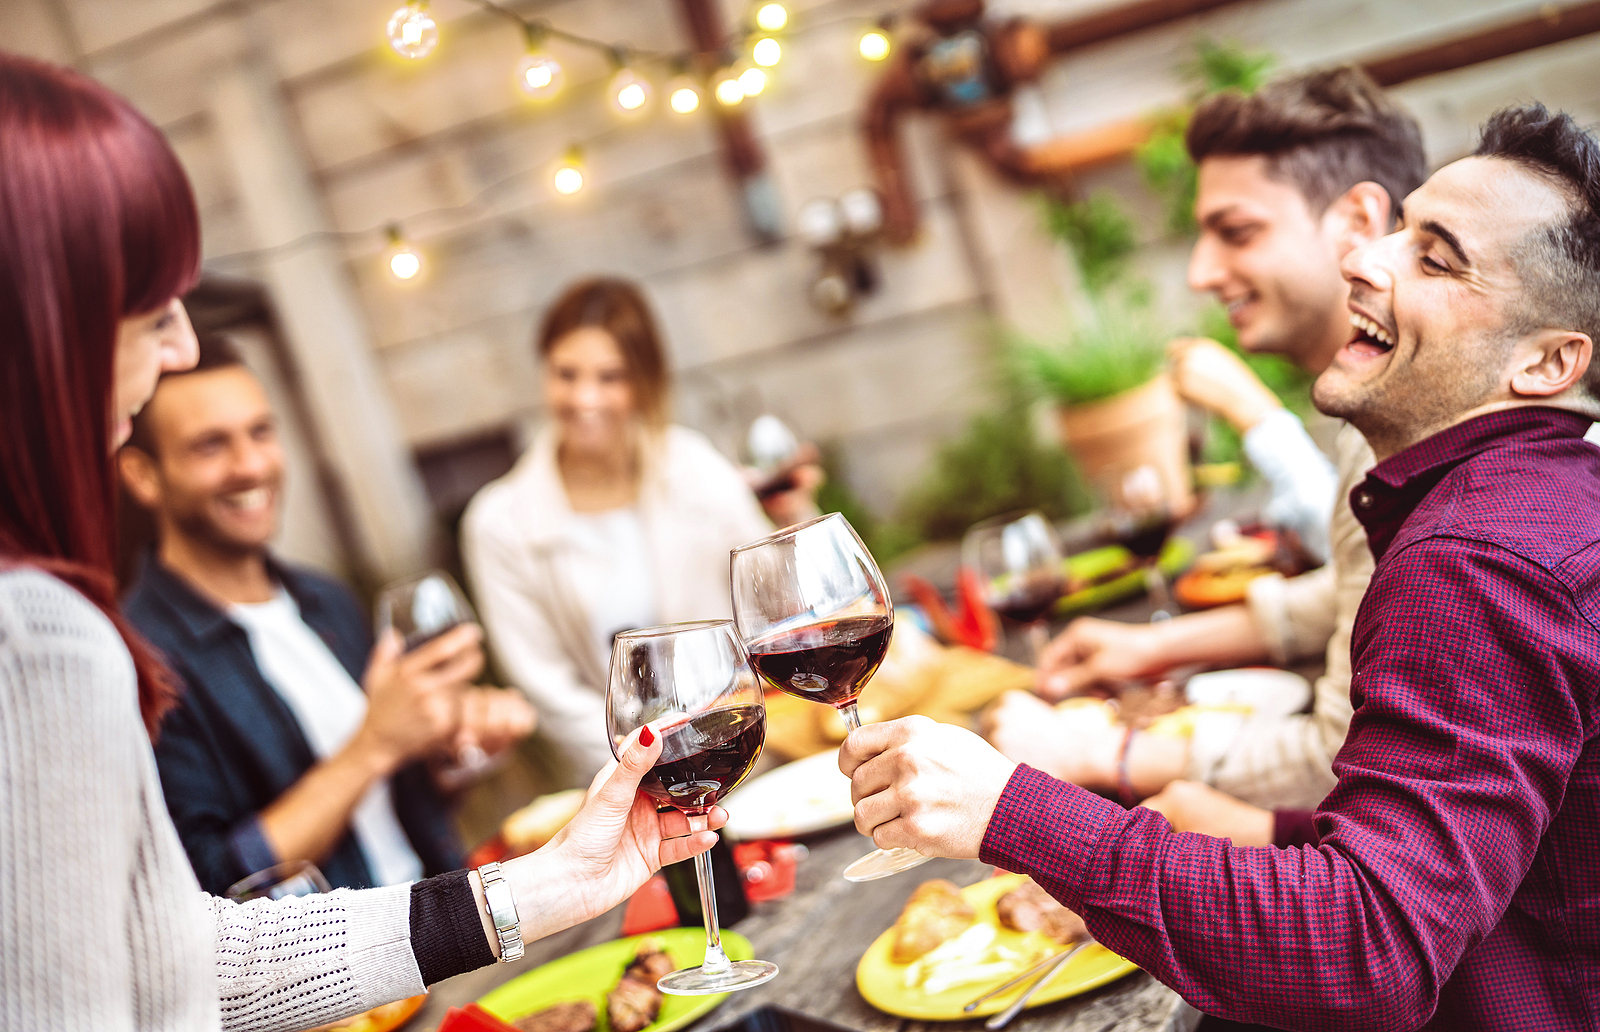 bigstock-Happy-Friends-Having-Fun-Drink-381051104